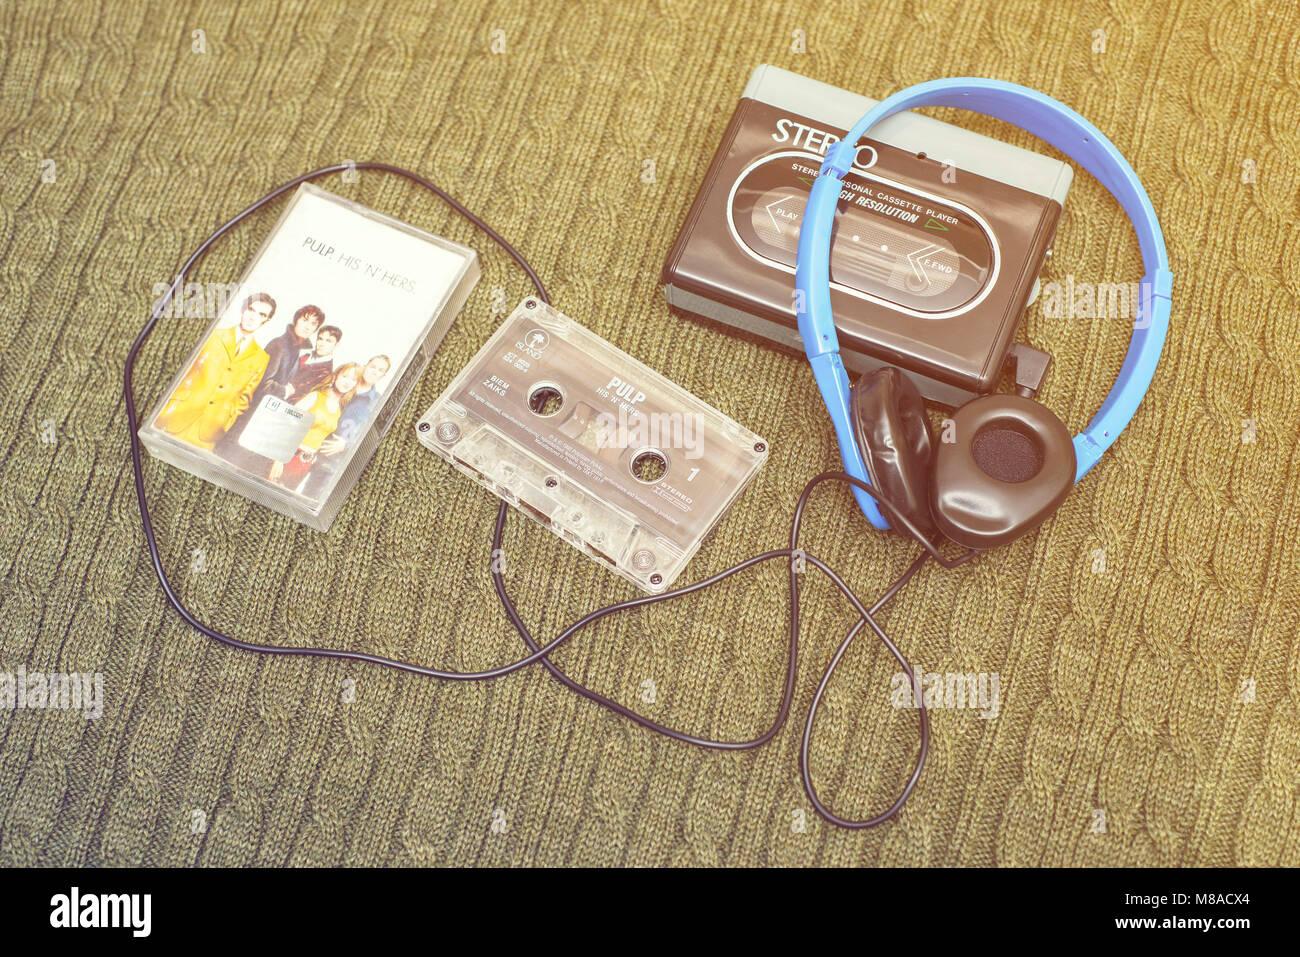 Vintage walkman, PULP cassete and headphones. - Stock Image